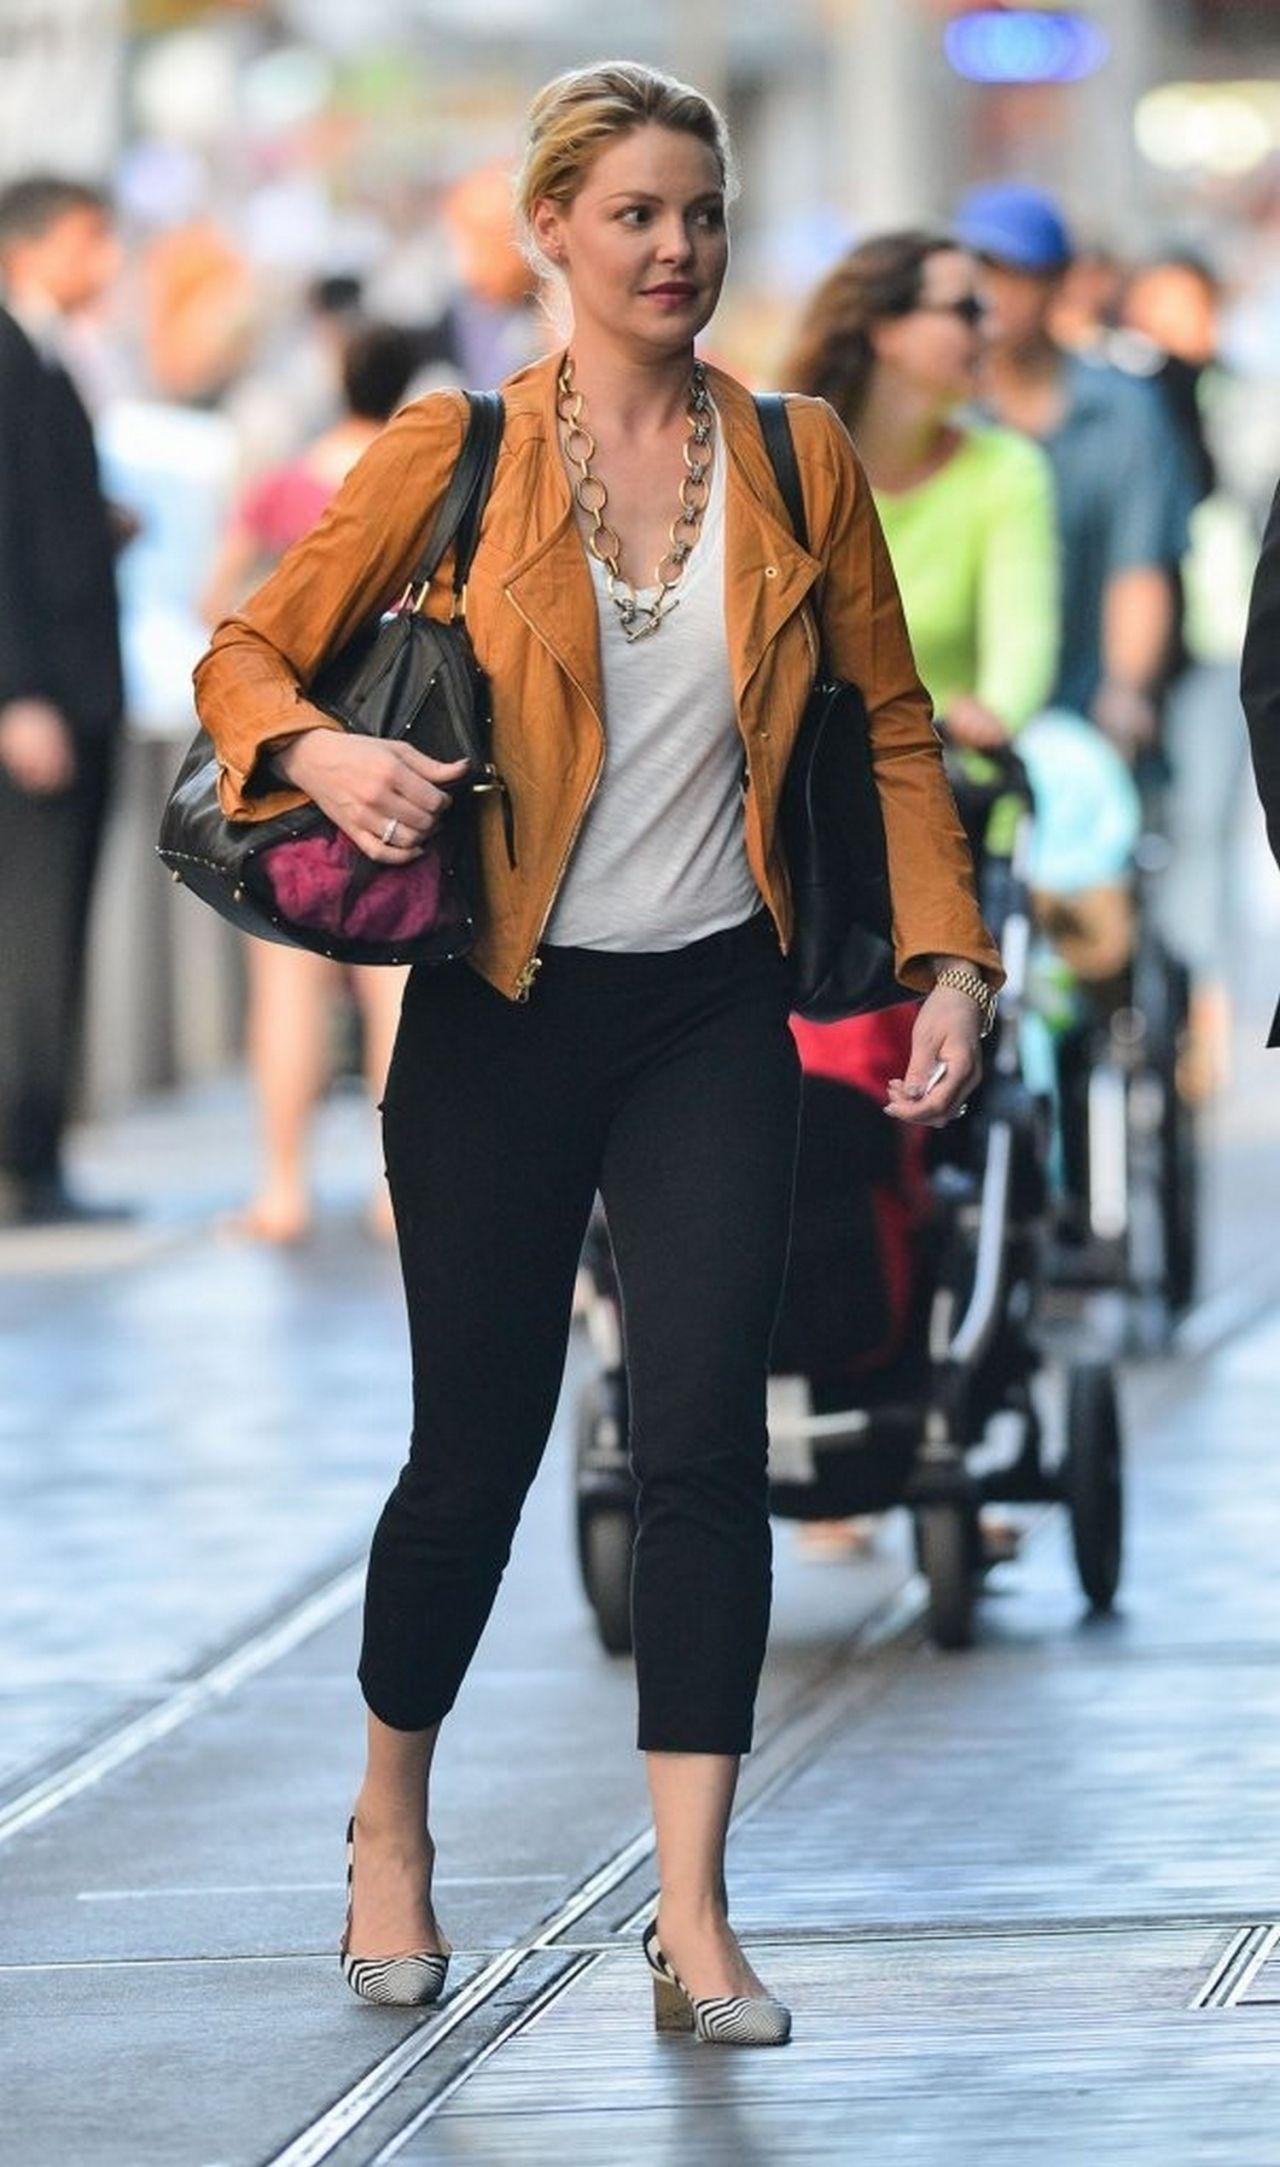 Katherine Heigl in New York City - May 2014